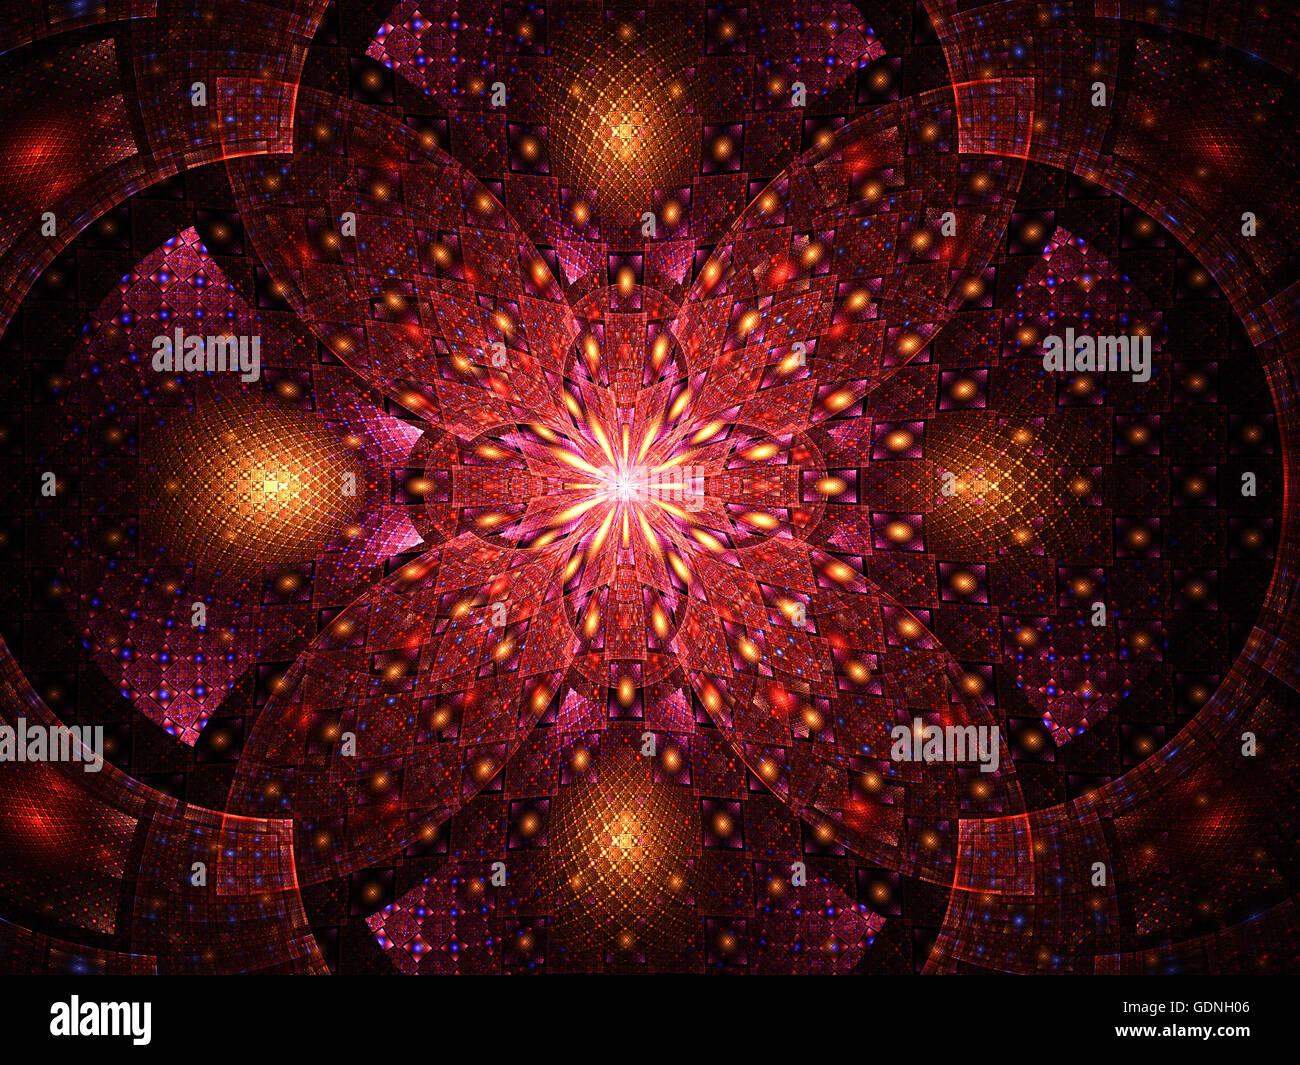 Abstract fractal fantasy magenta pattern.Fractal artwork for creative design,flyer cover, interior, poster. - Stock Image